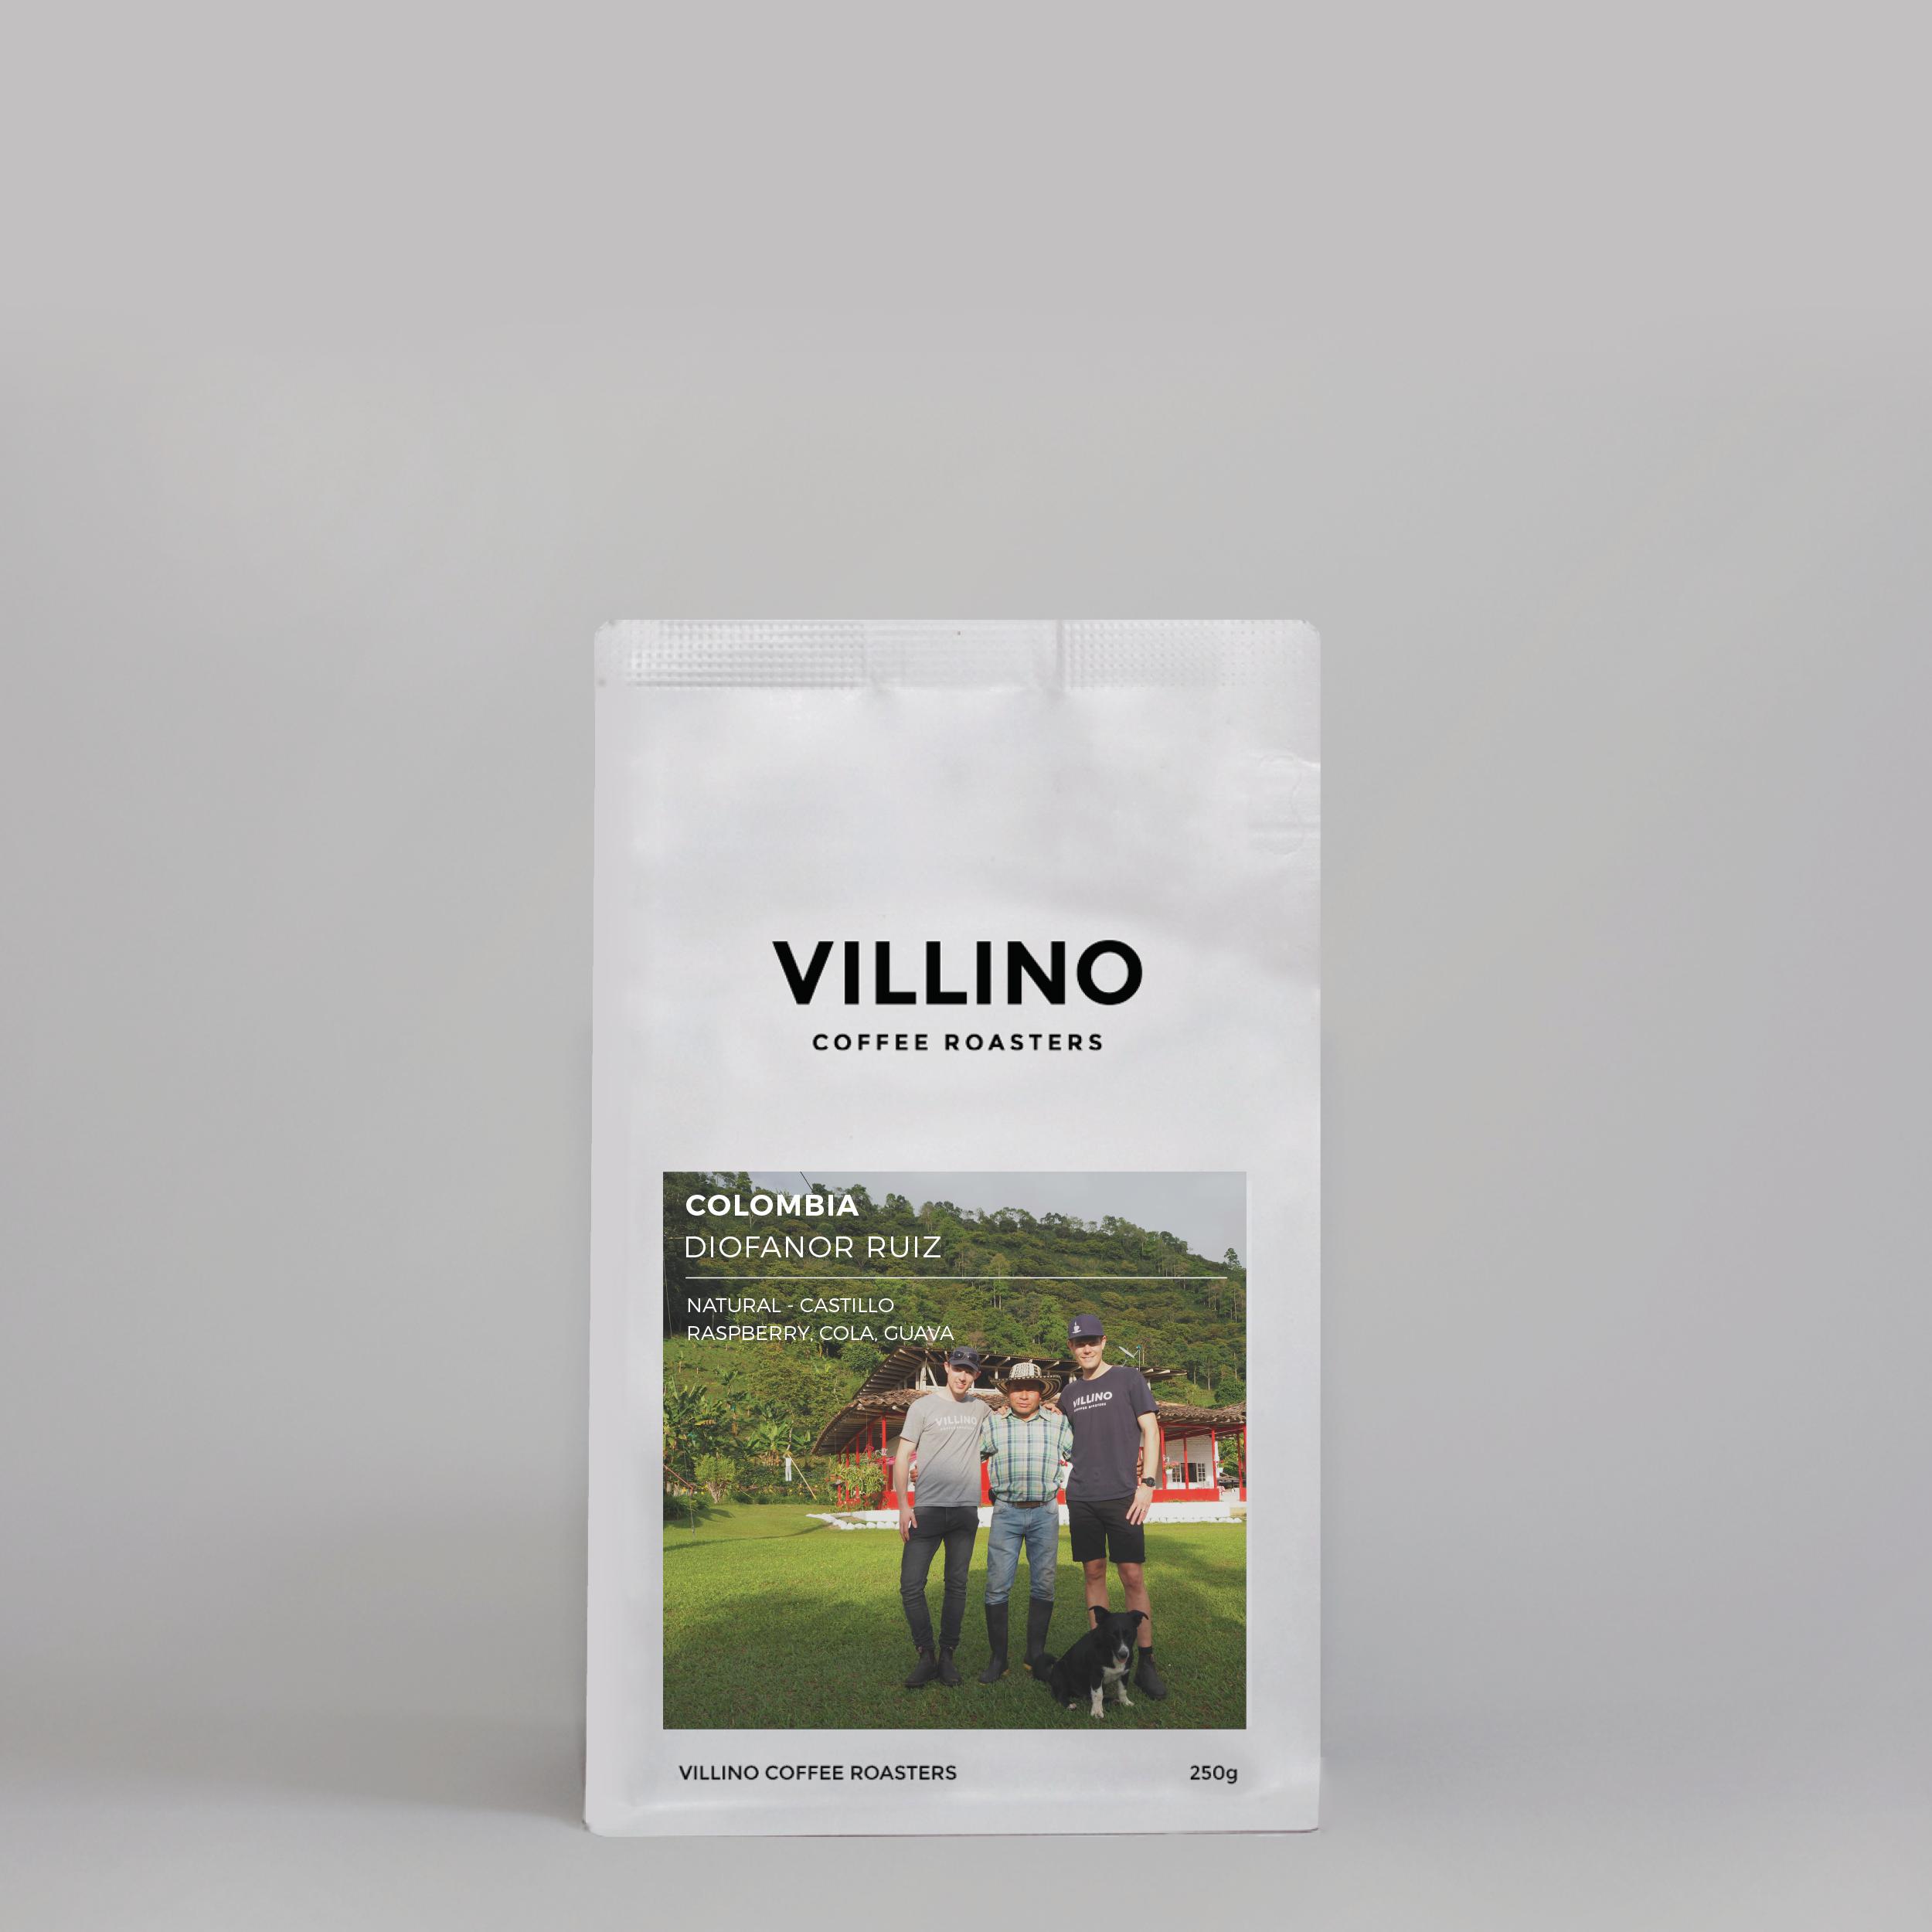 Villino_Retail Bag Diofanor Ruiz_600x600px.png